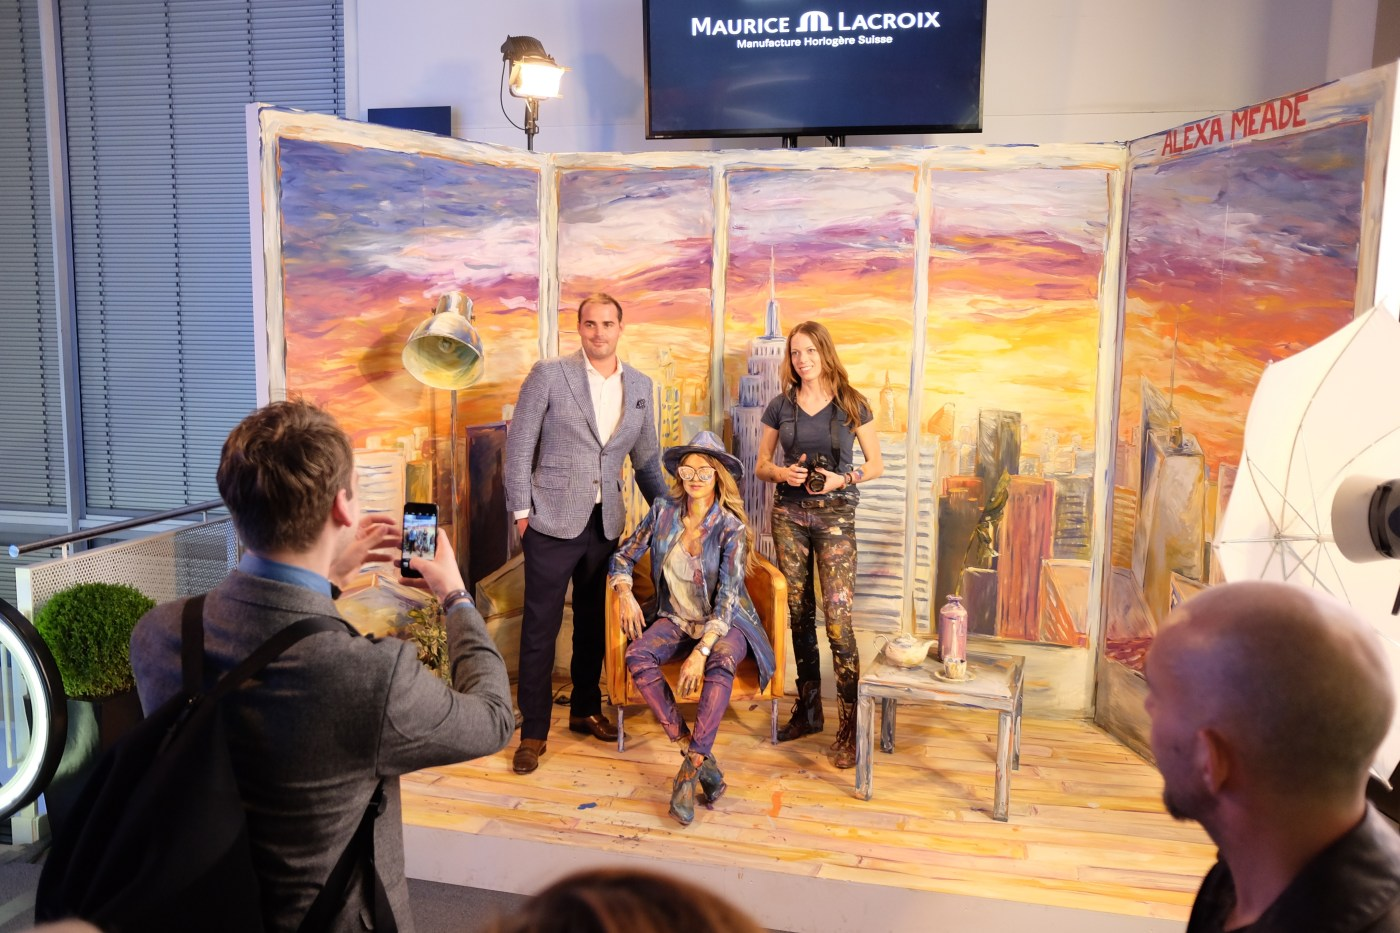 Maurice Lacroix Baselworld 2017